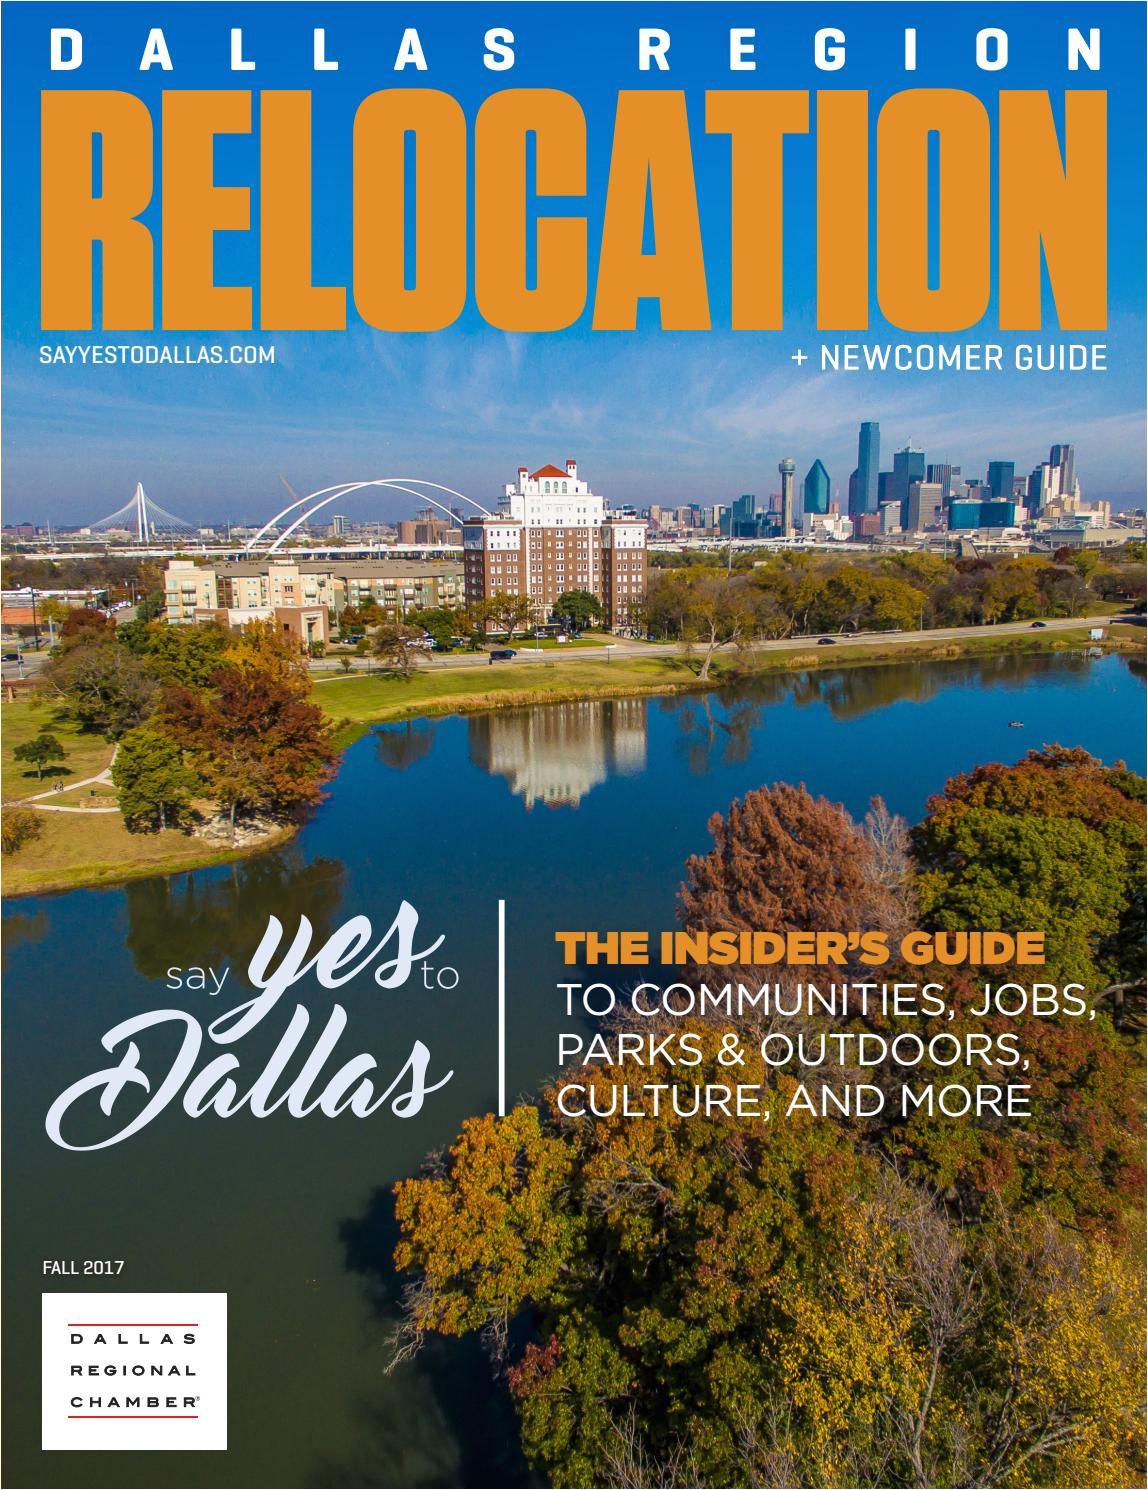 dallas region relocation newcomer guide fall 2017 by dallas regional chamber publications issuu